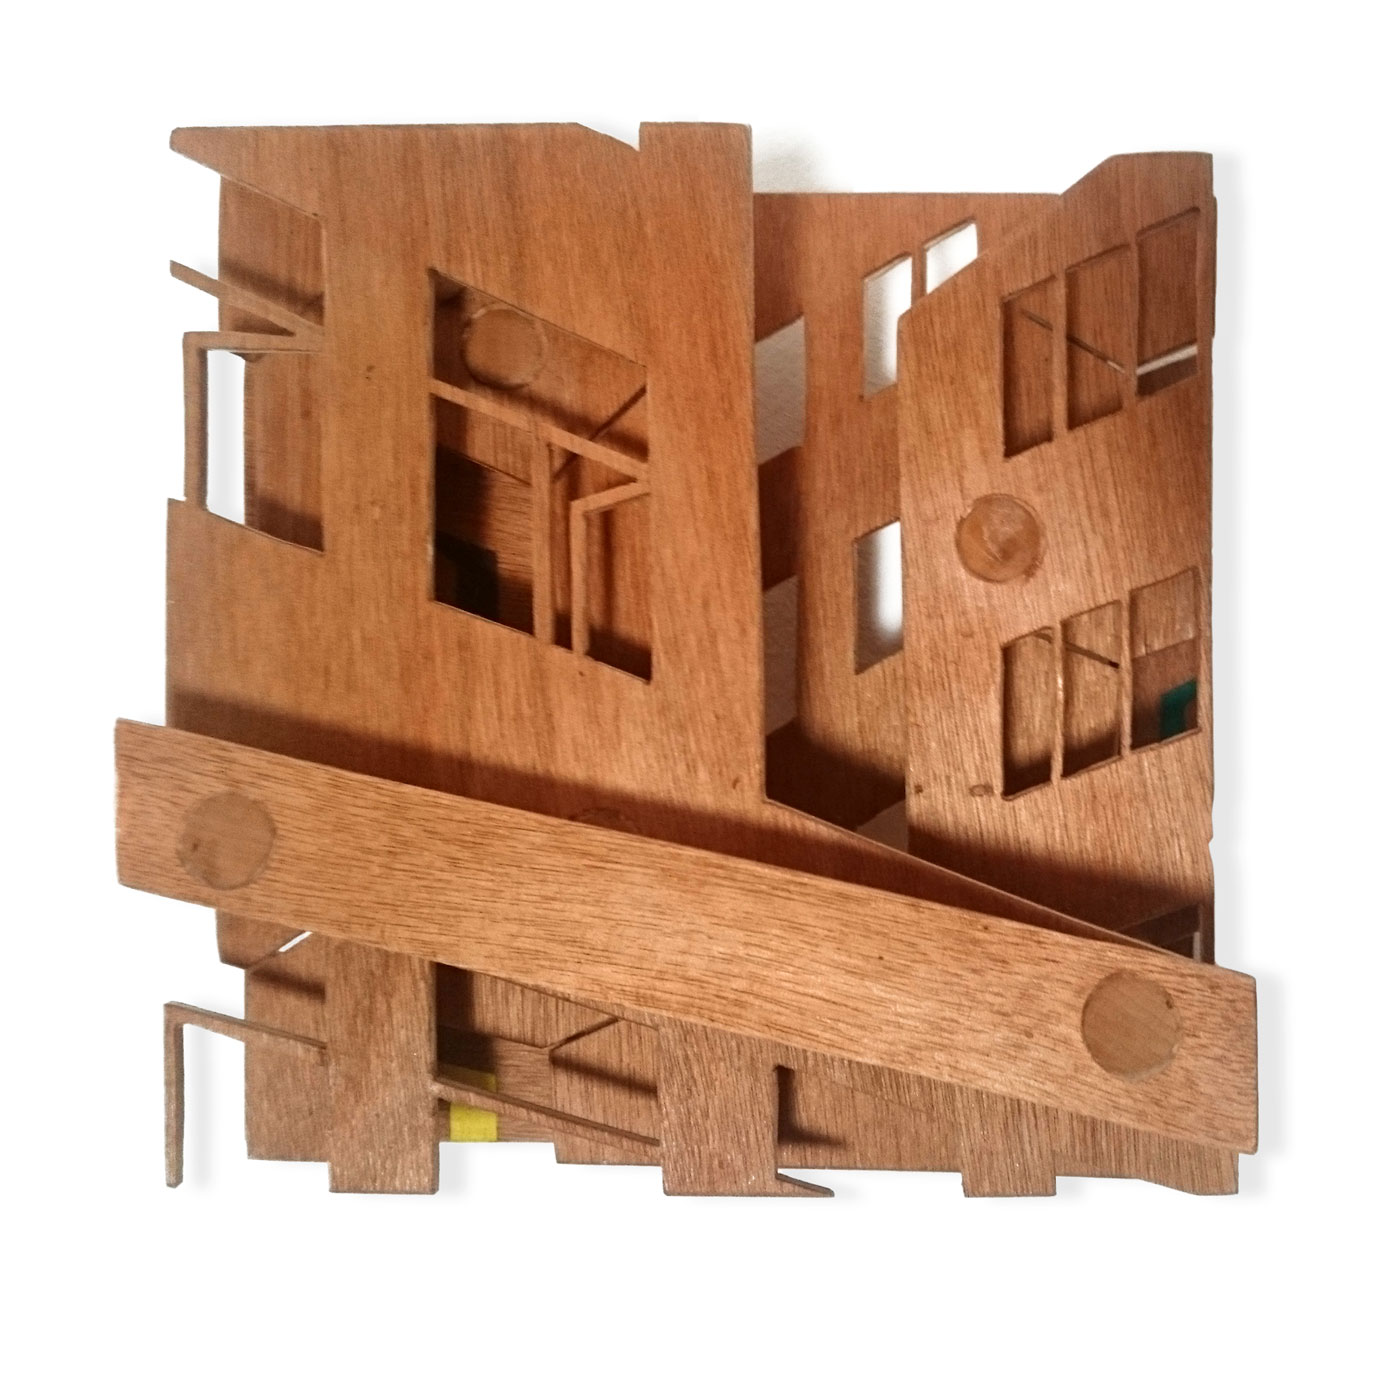 TINY VASISTAS I, © 2015,  oiled plywood and acrylic paint, 25 x 25 x 7 cm